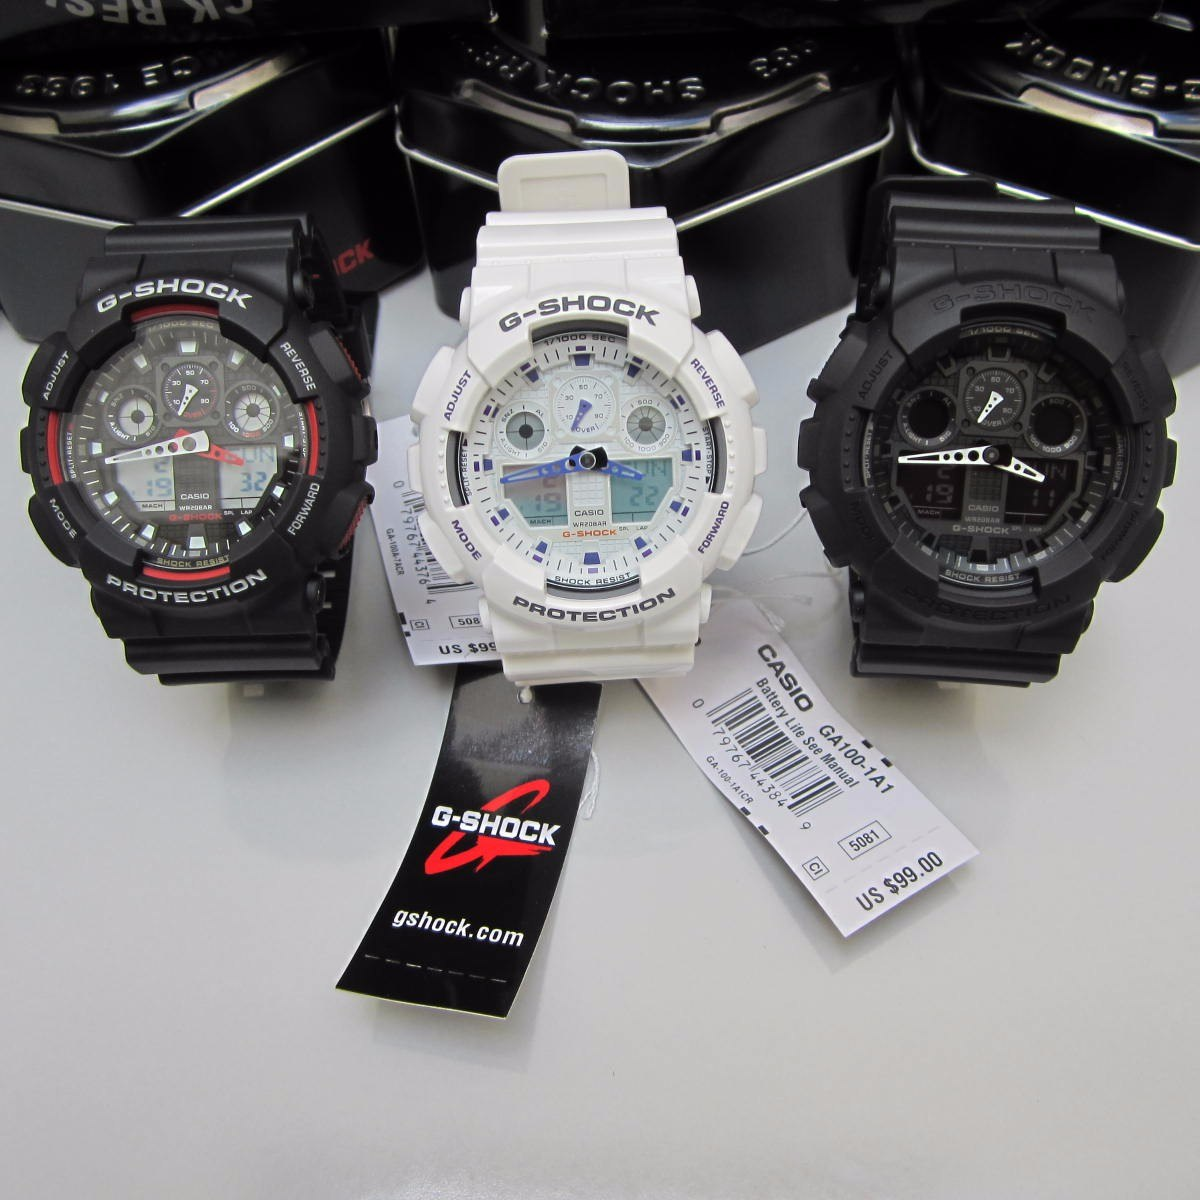 Casio G Shock Relojes Deportivos Para Hombre En Mercado Original Ga 100 1a4 Jam Tangan Pria Resin Black Reloj Ga100 Originales